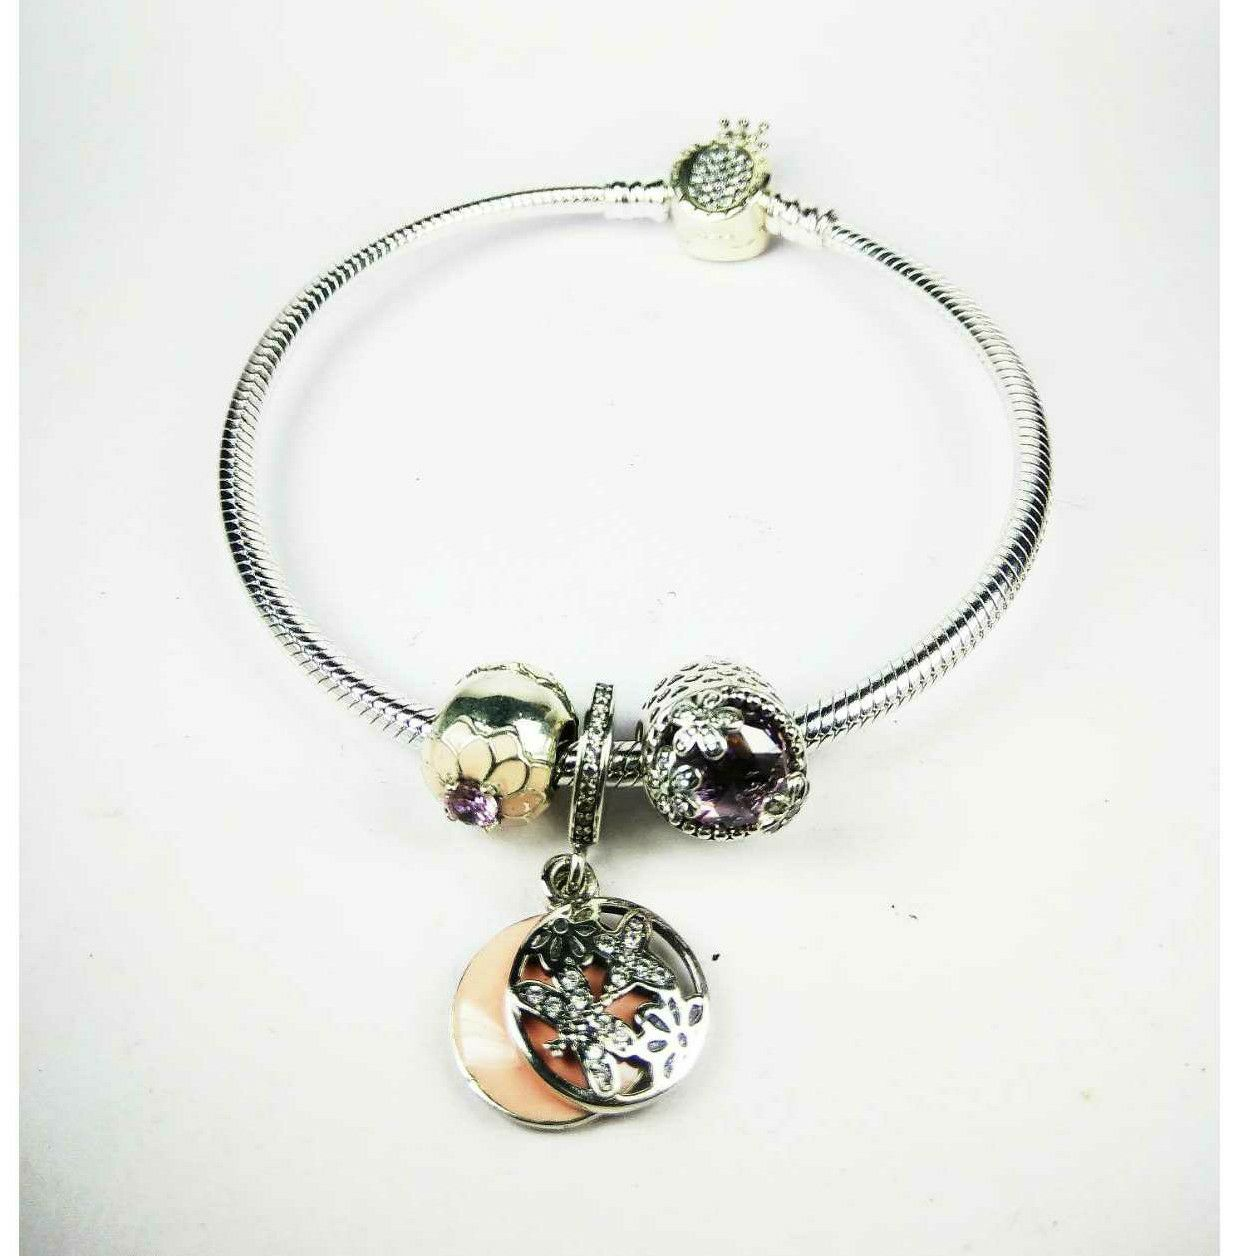 Expensive Fancy 925 Silver Ladies Pandora Kada Bracelet With Flowers